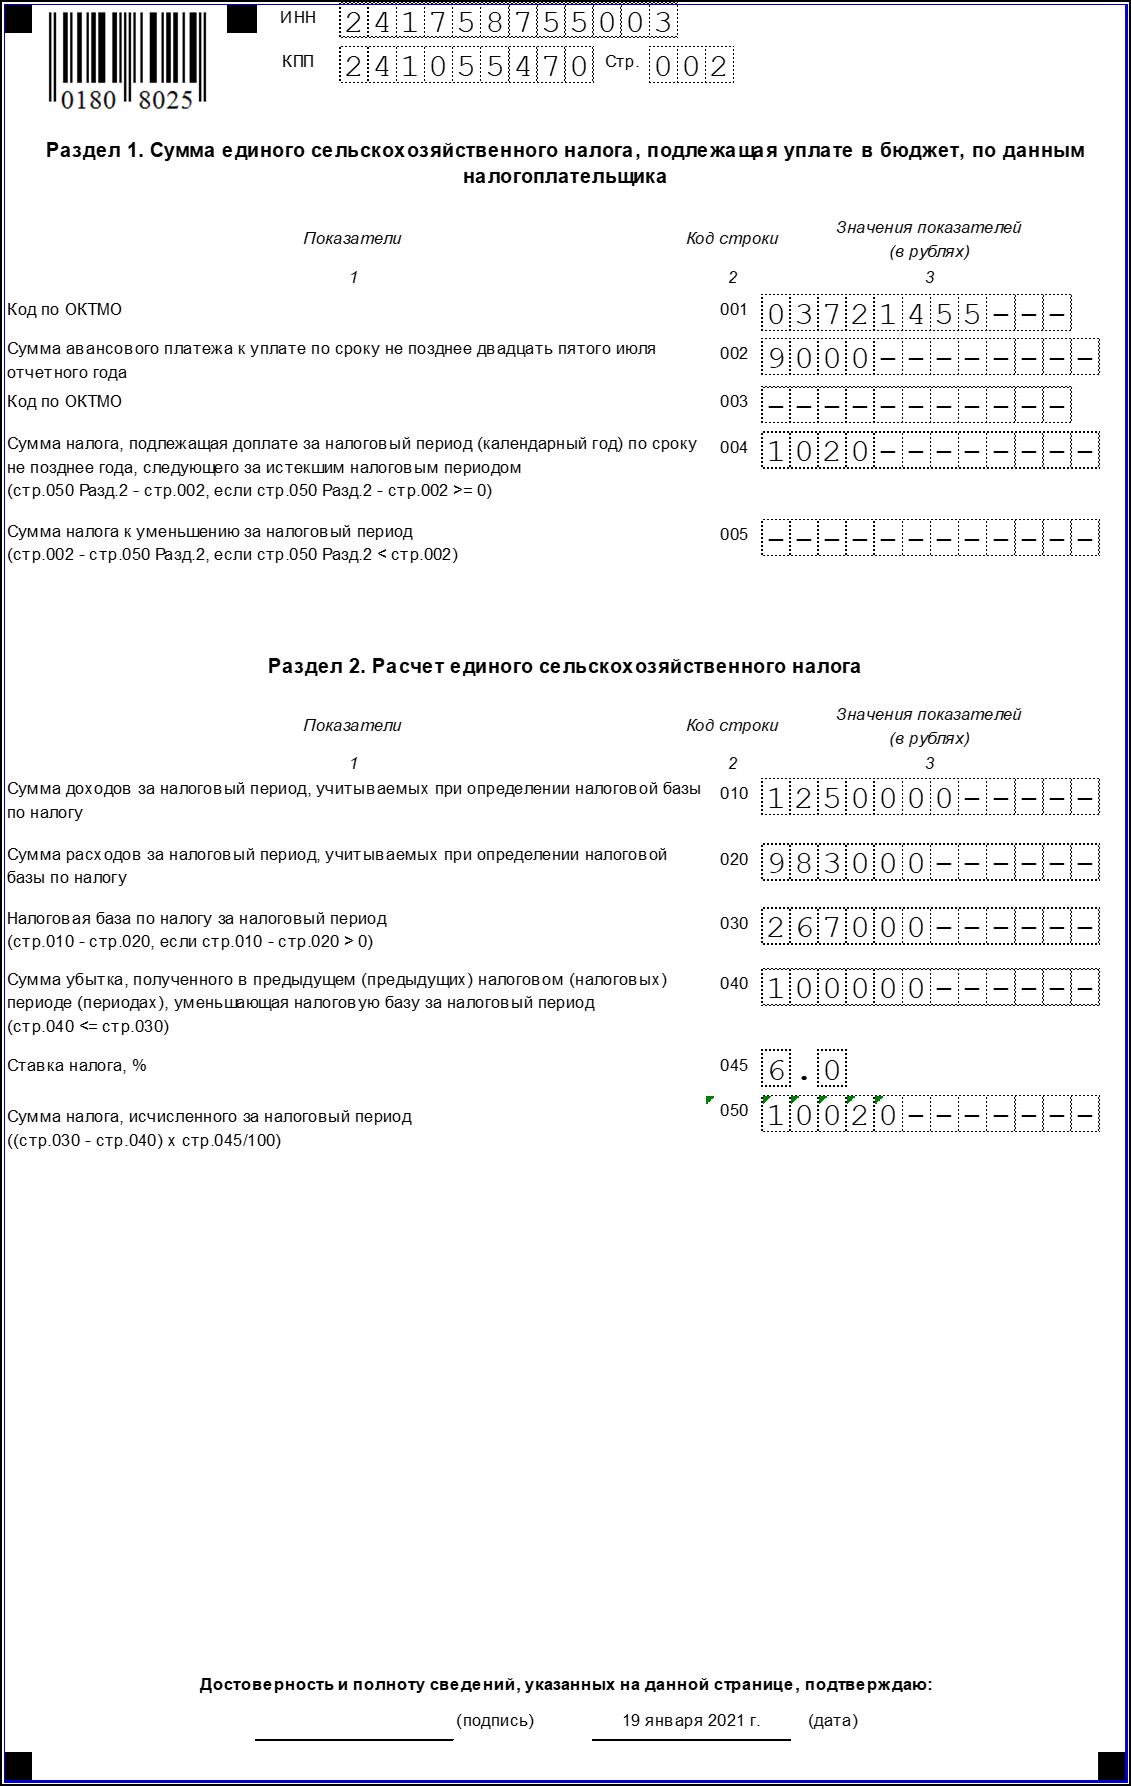 Раздел 1 и 2 декларации ЕСХН